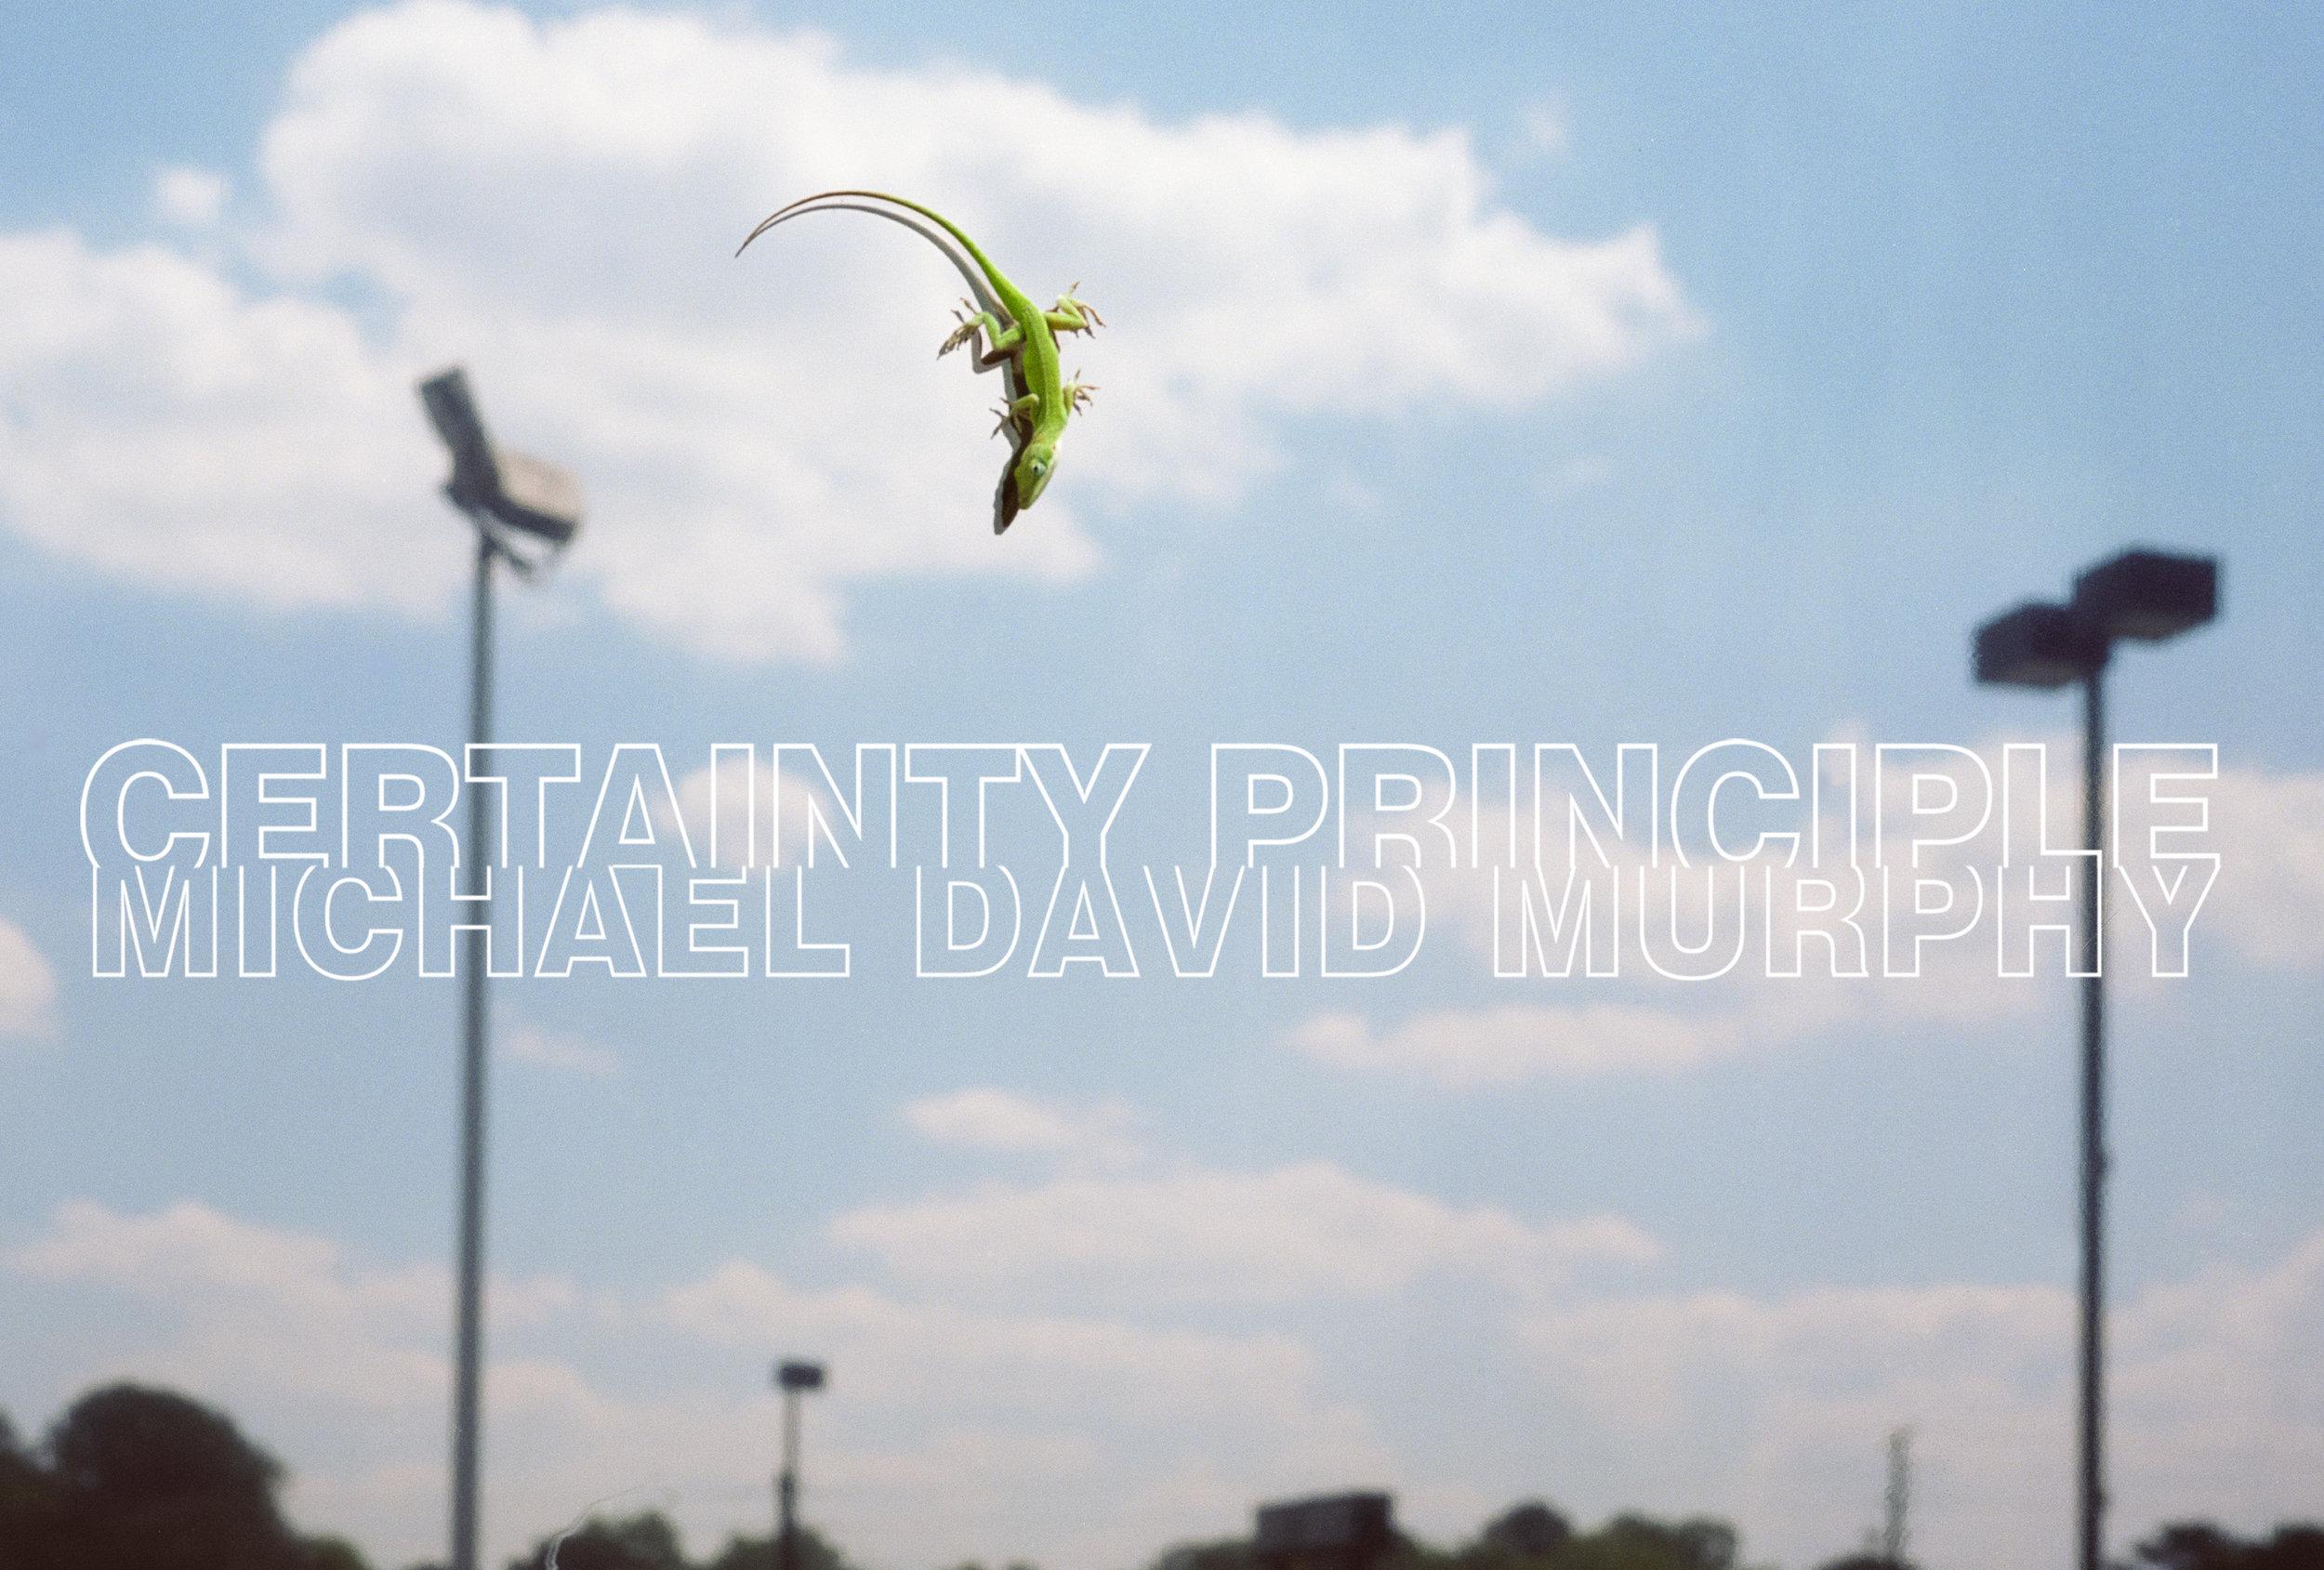 michael david murphy.jpg